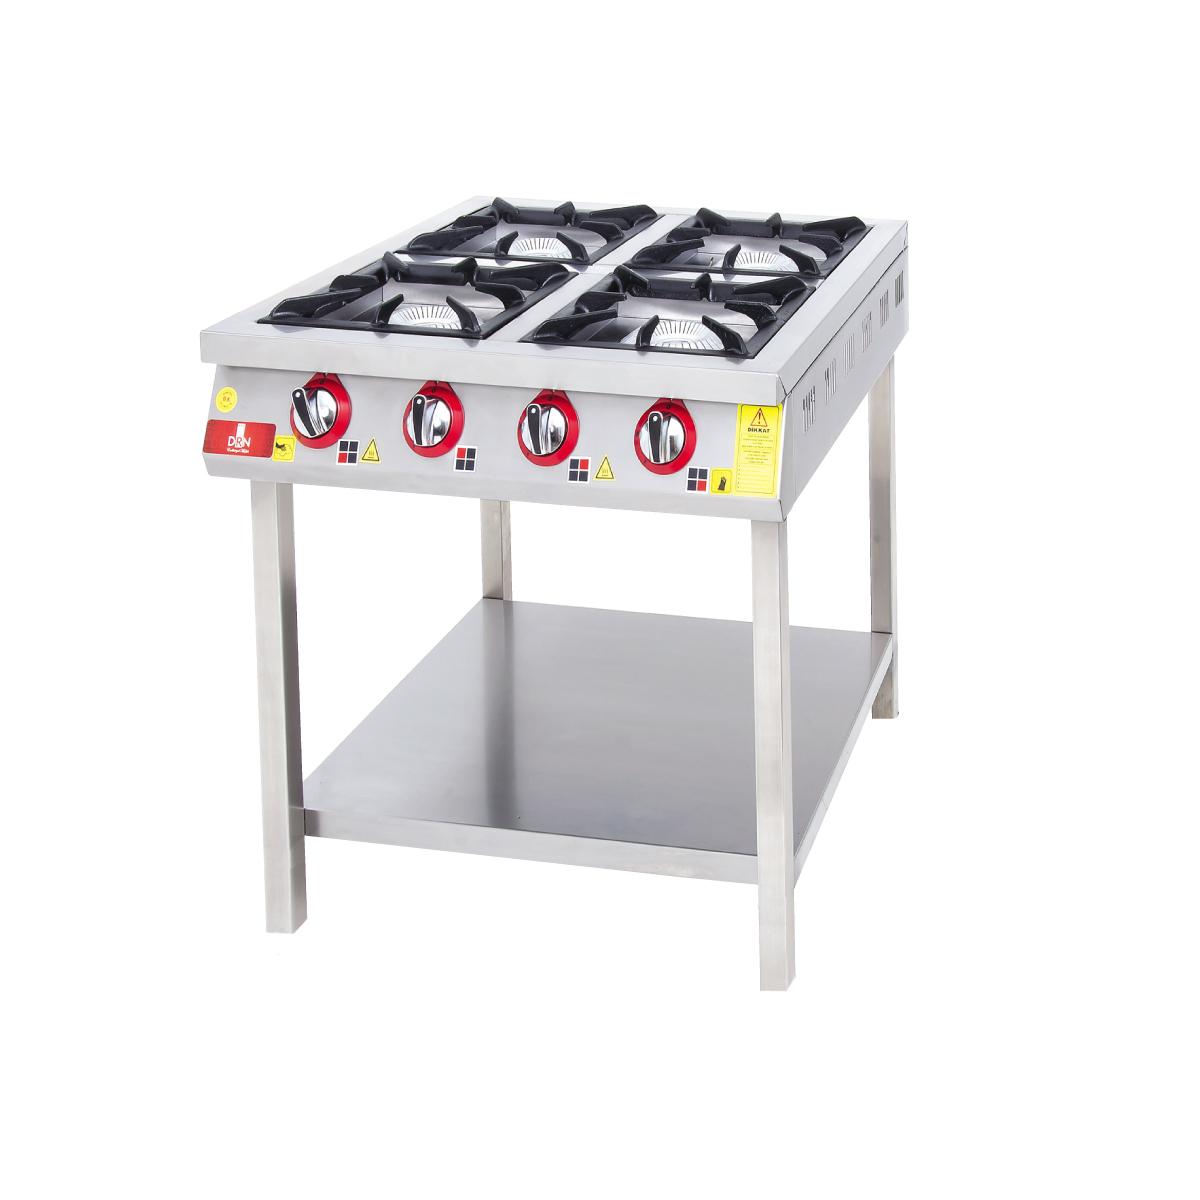 Range With Bottom Shelf 4 Burners - 80x90 - Gas